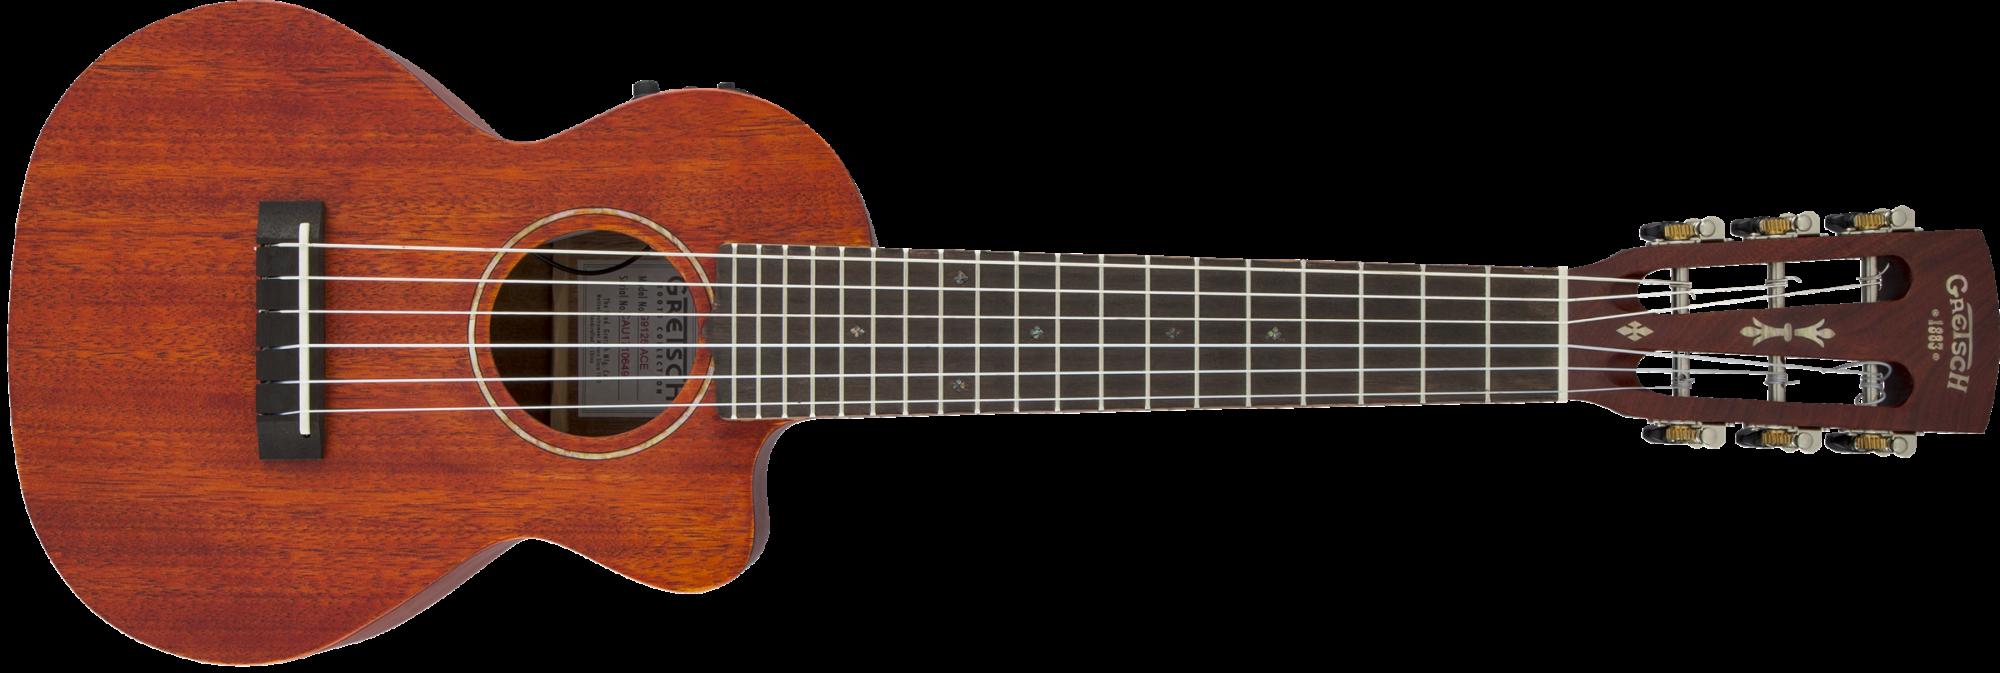 Gretsch G9126 A.C.E. Guitar-Ukulele With Gig Bag